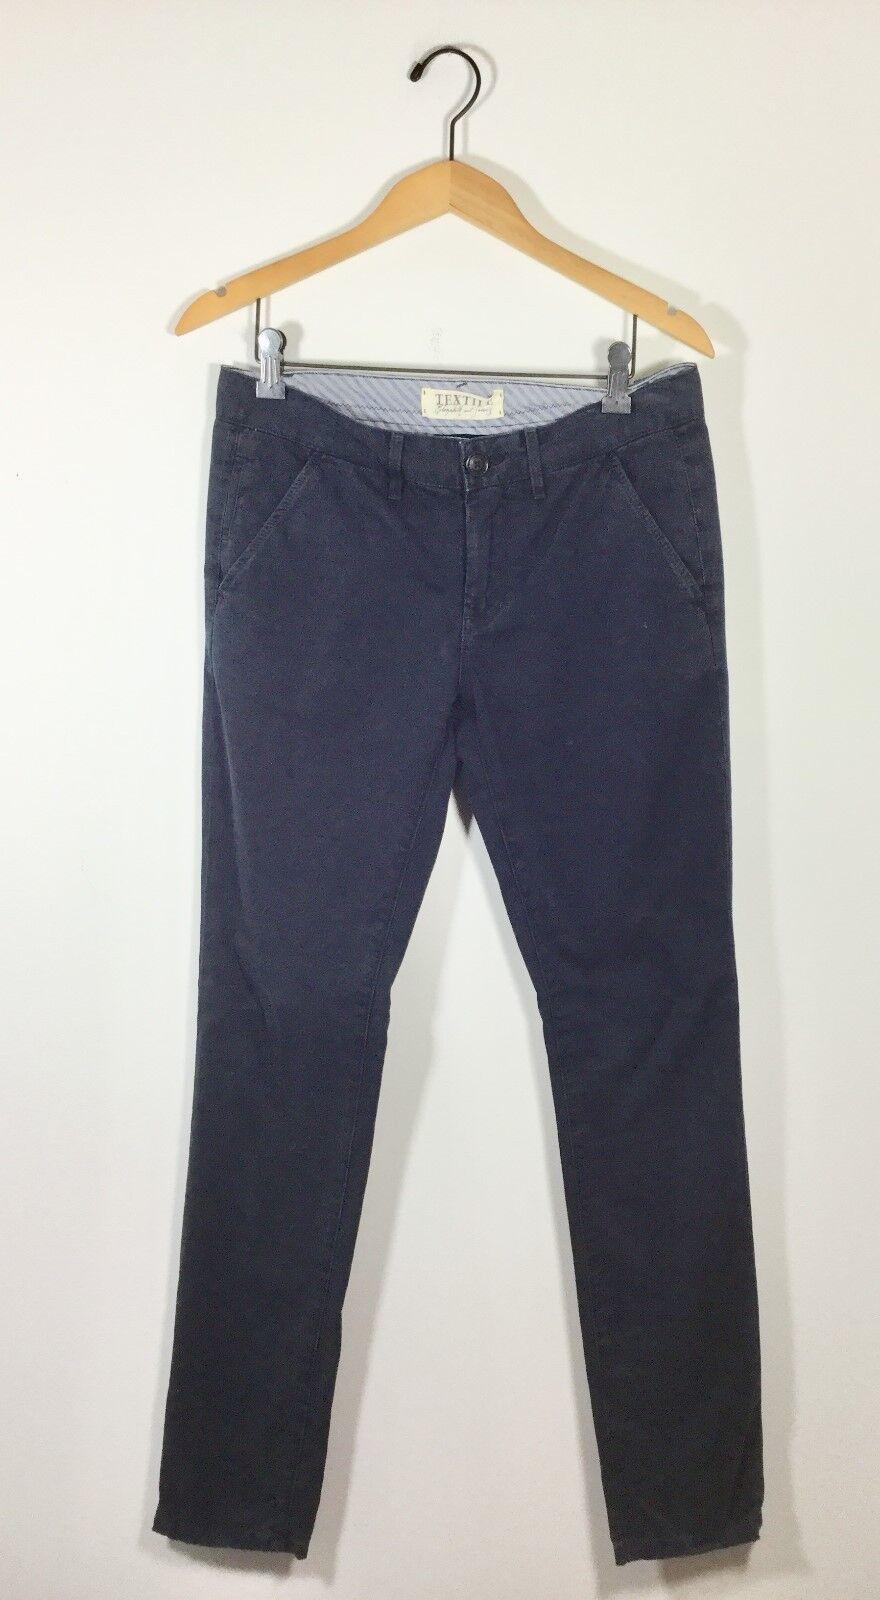 NWT  195 ELIZABETH & JAMES TEXTILE Navy Cotton Skinny Pant Größe 25